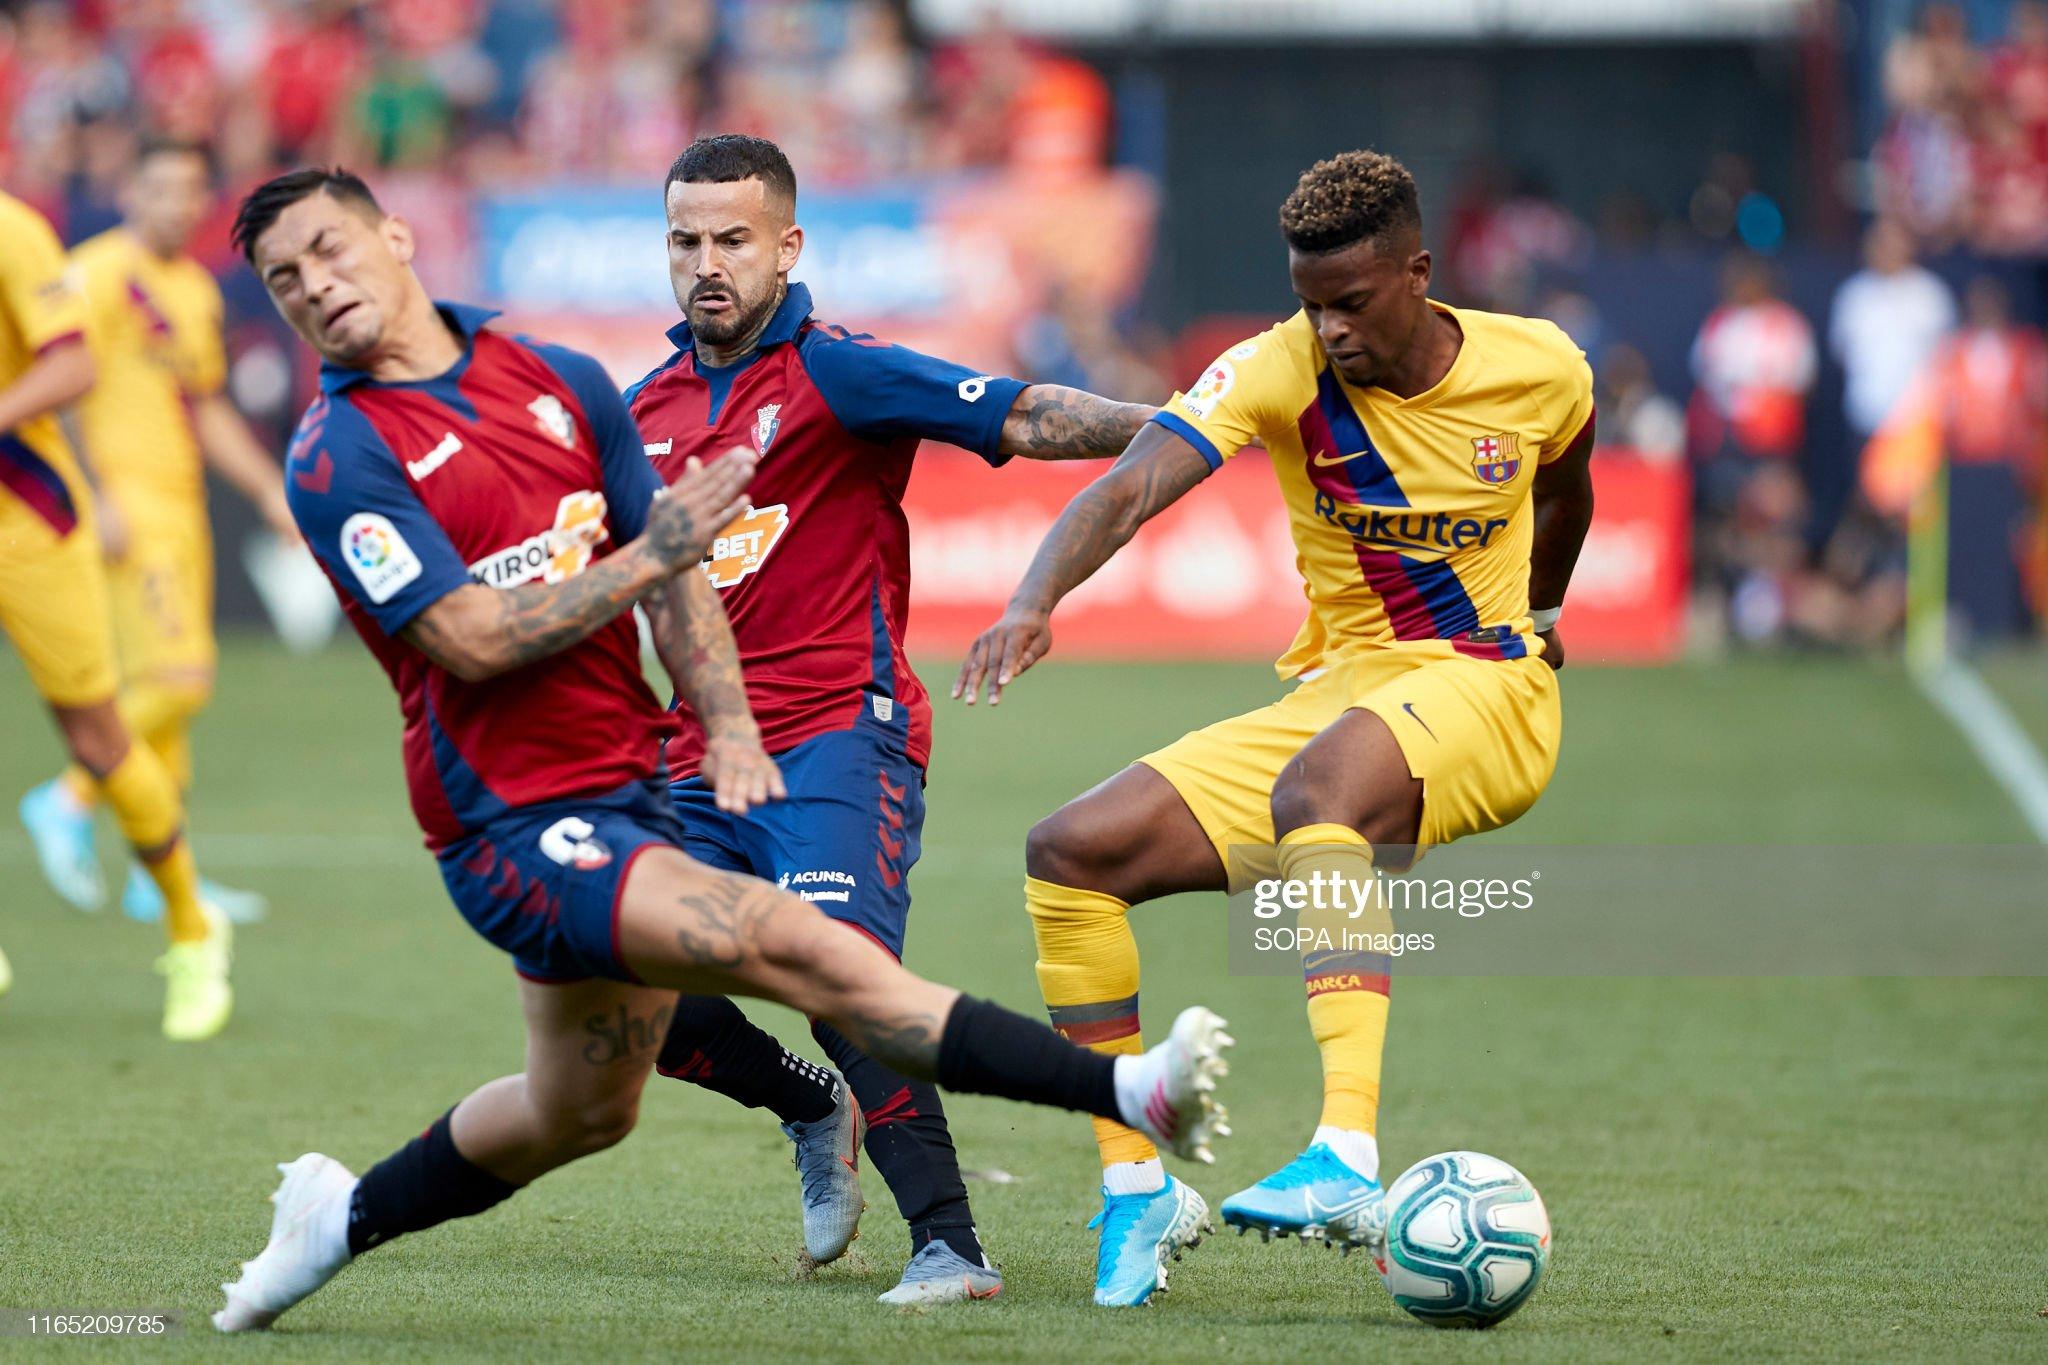 صور مباراة : أوساسونا - برشلونة 2-2 ( 31-08-2019 )  Nelson-semedo-chimy-avila-and-ruben-garca-in-action-during-the-la-picture-id1165209785?s=2048x2048